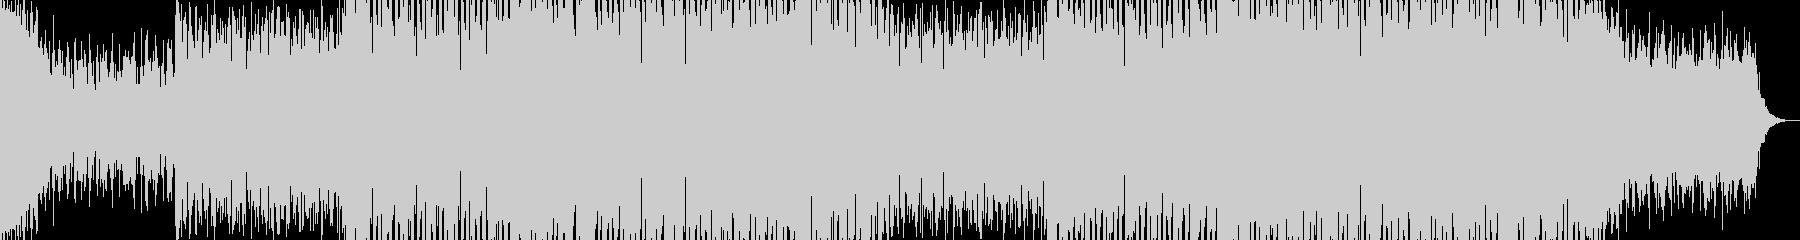 EDMポップで明るいクラブ系-104の未再生の波形